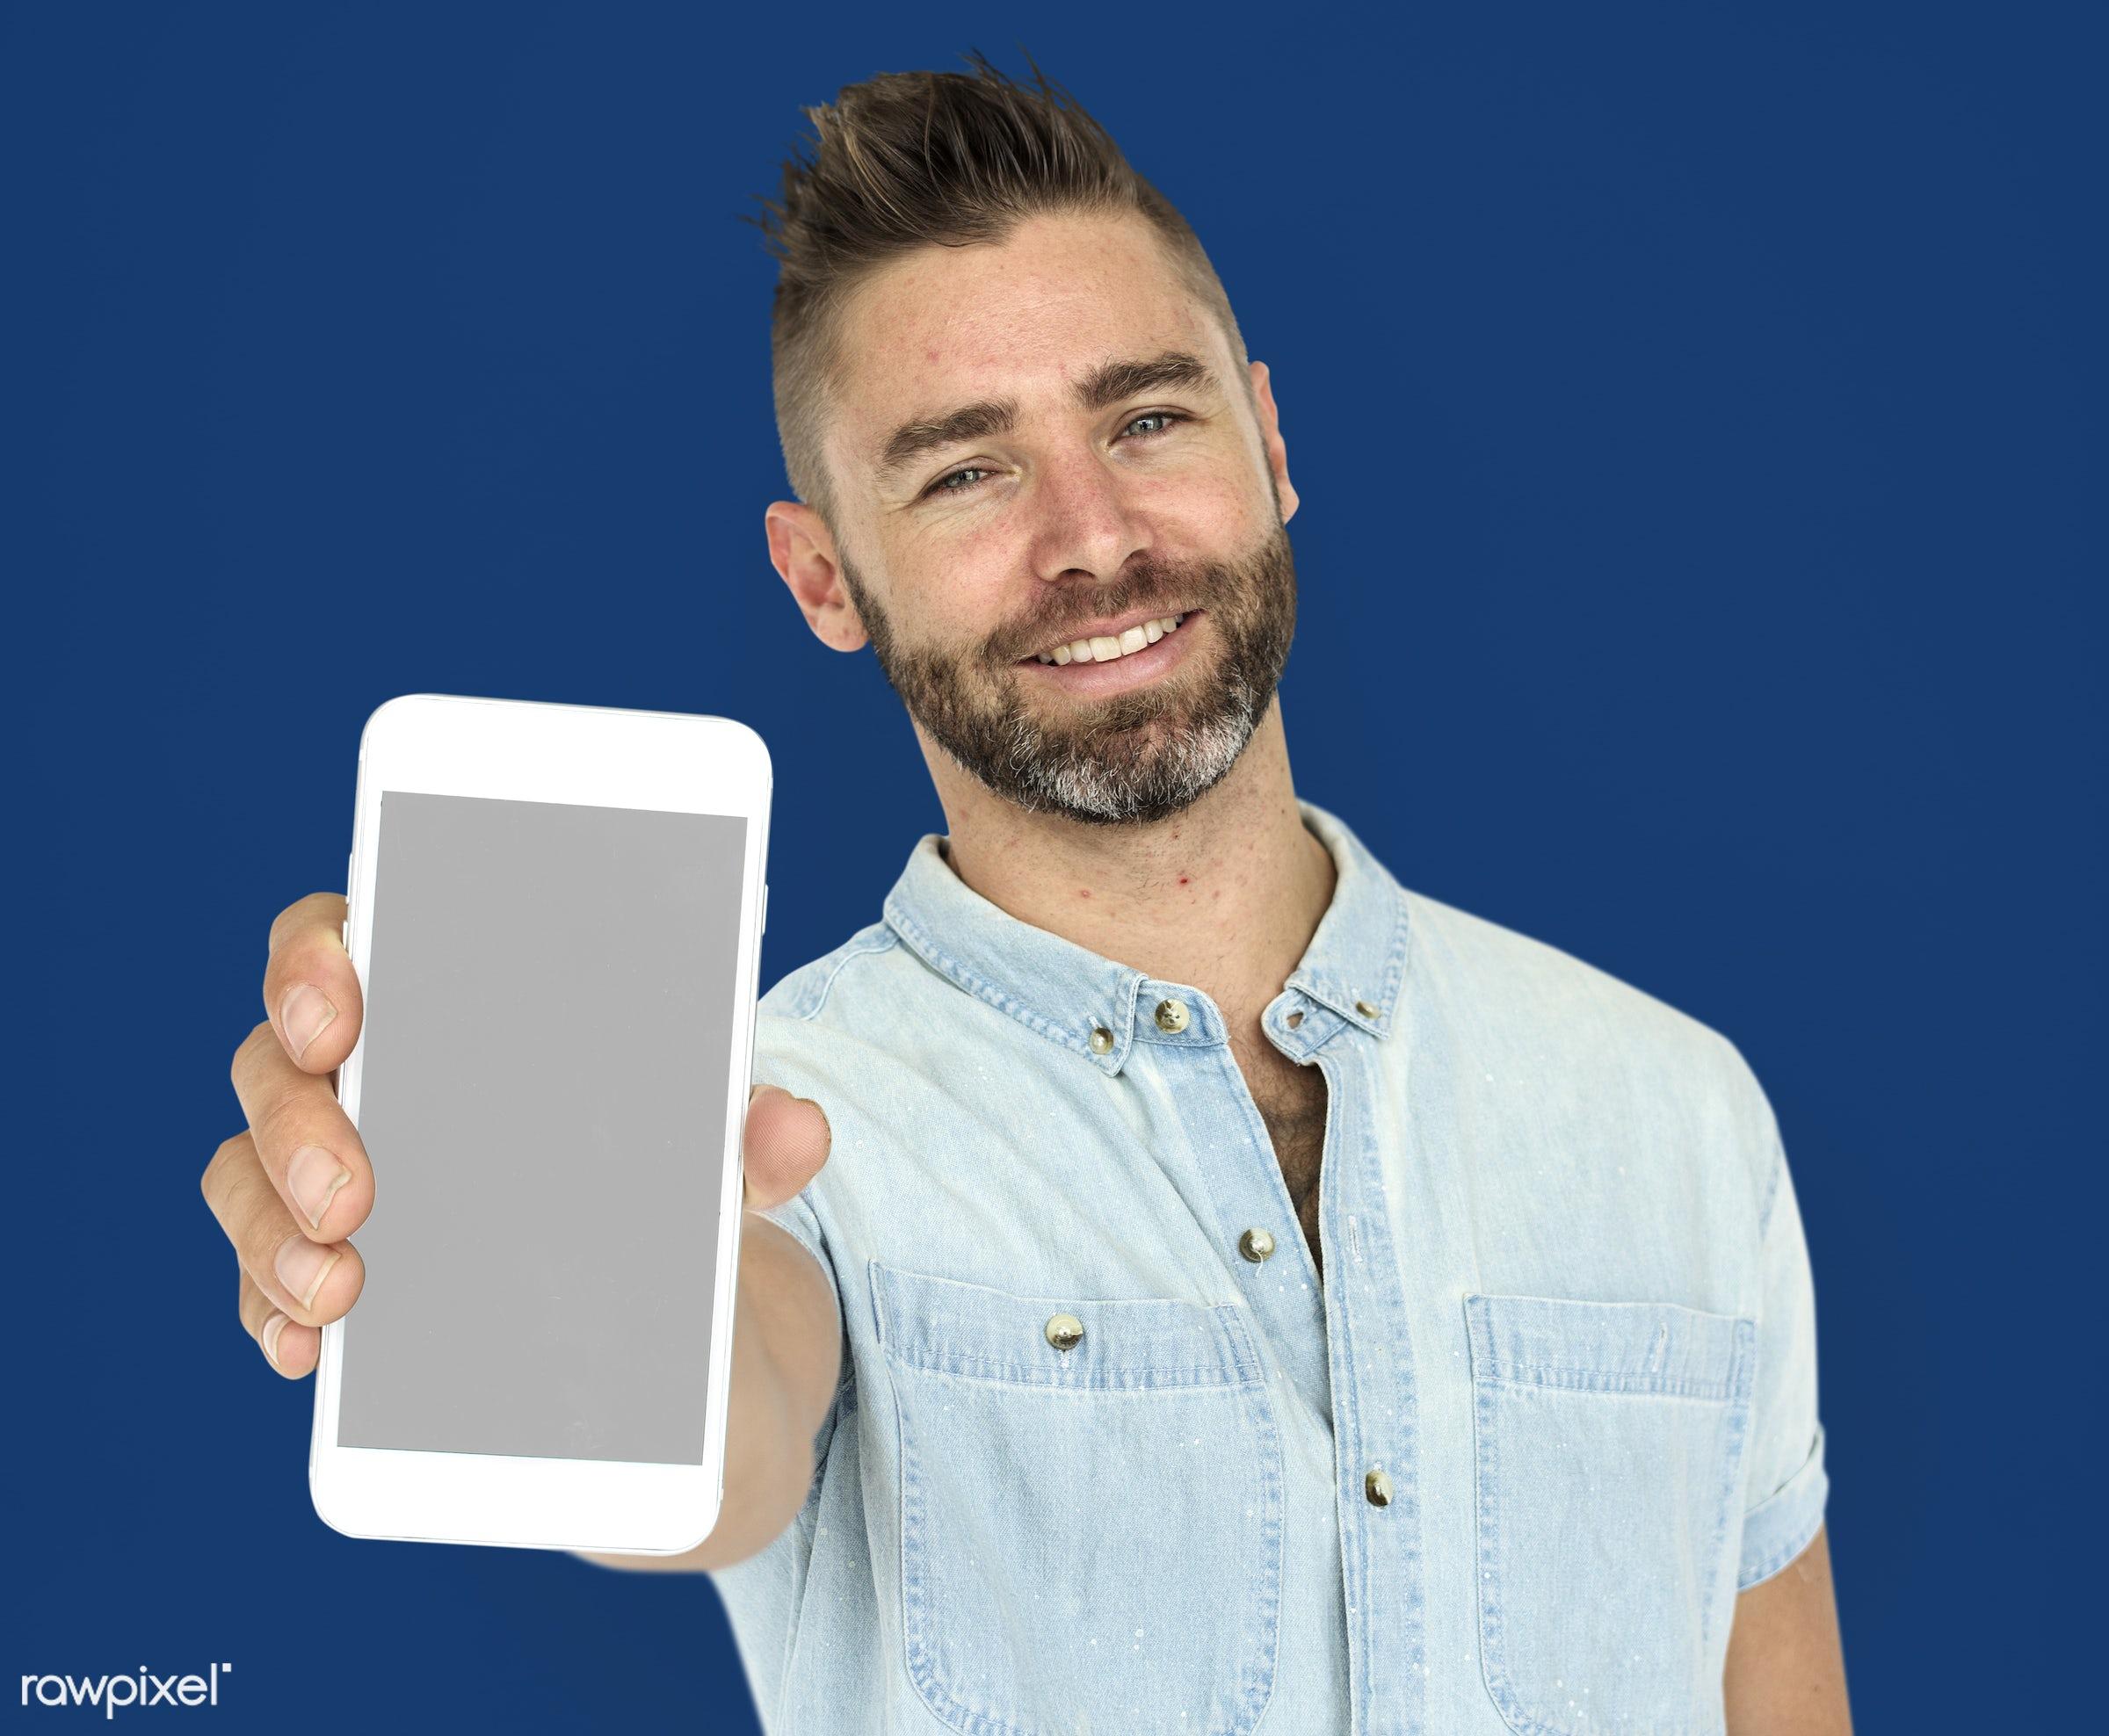 background, beard, blue, caucasian, communication, device, emotion, expression, holding, holding phone, isolated, male, man...